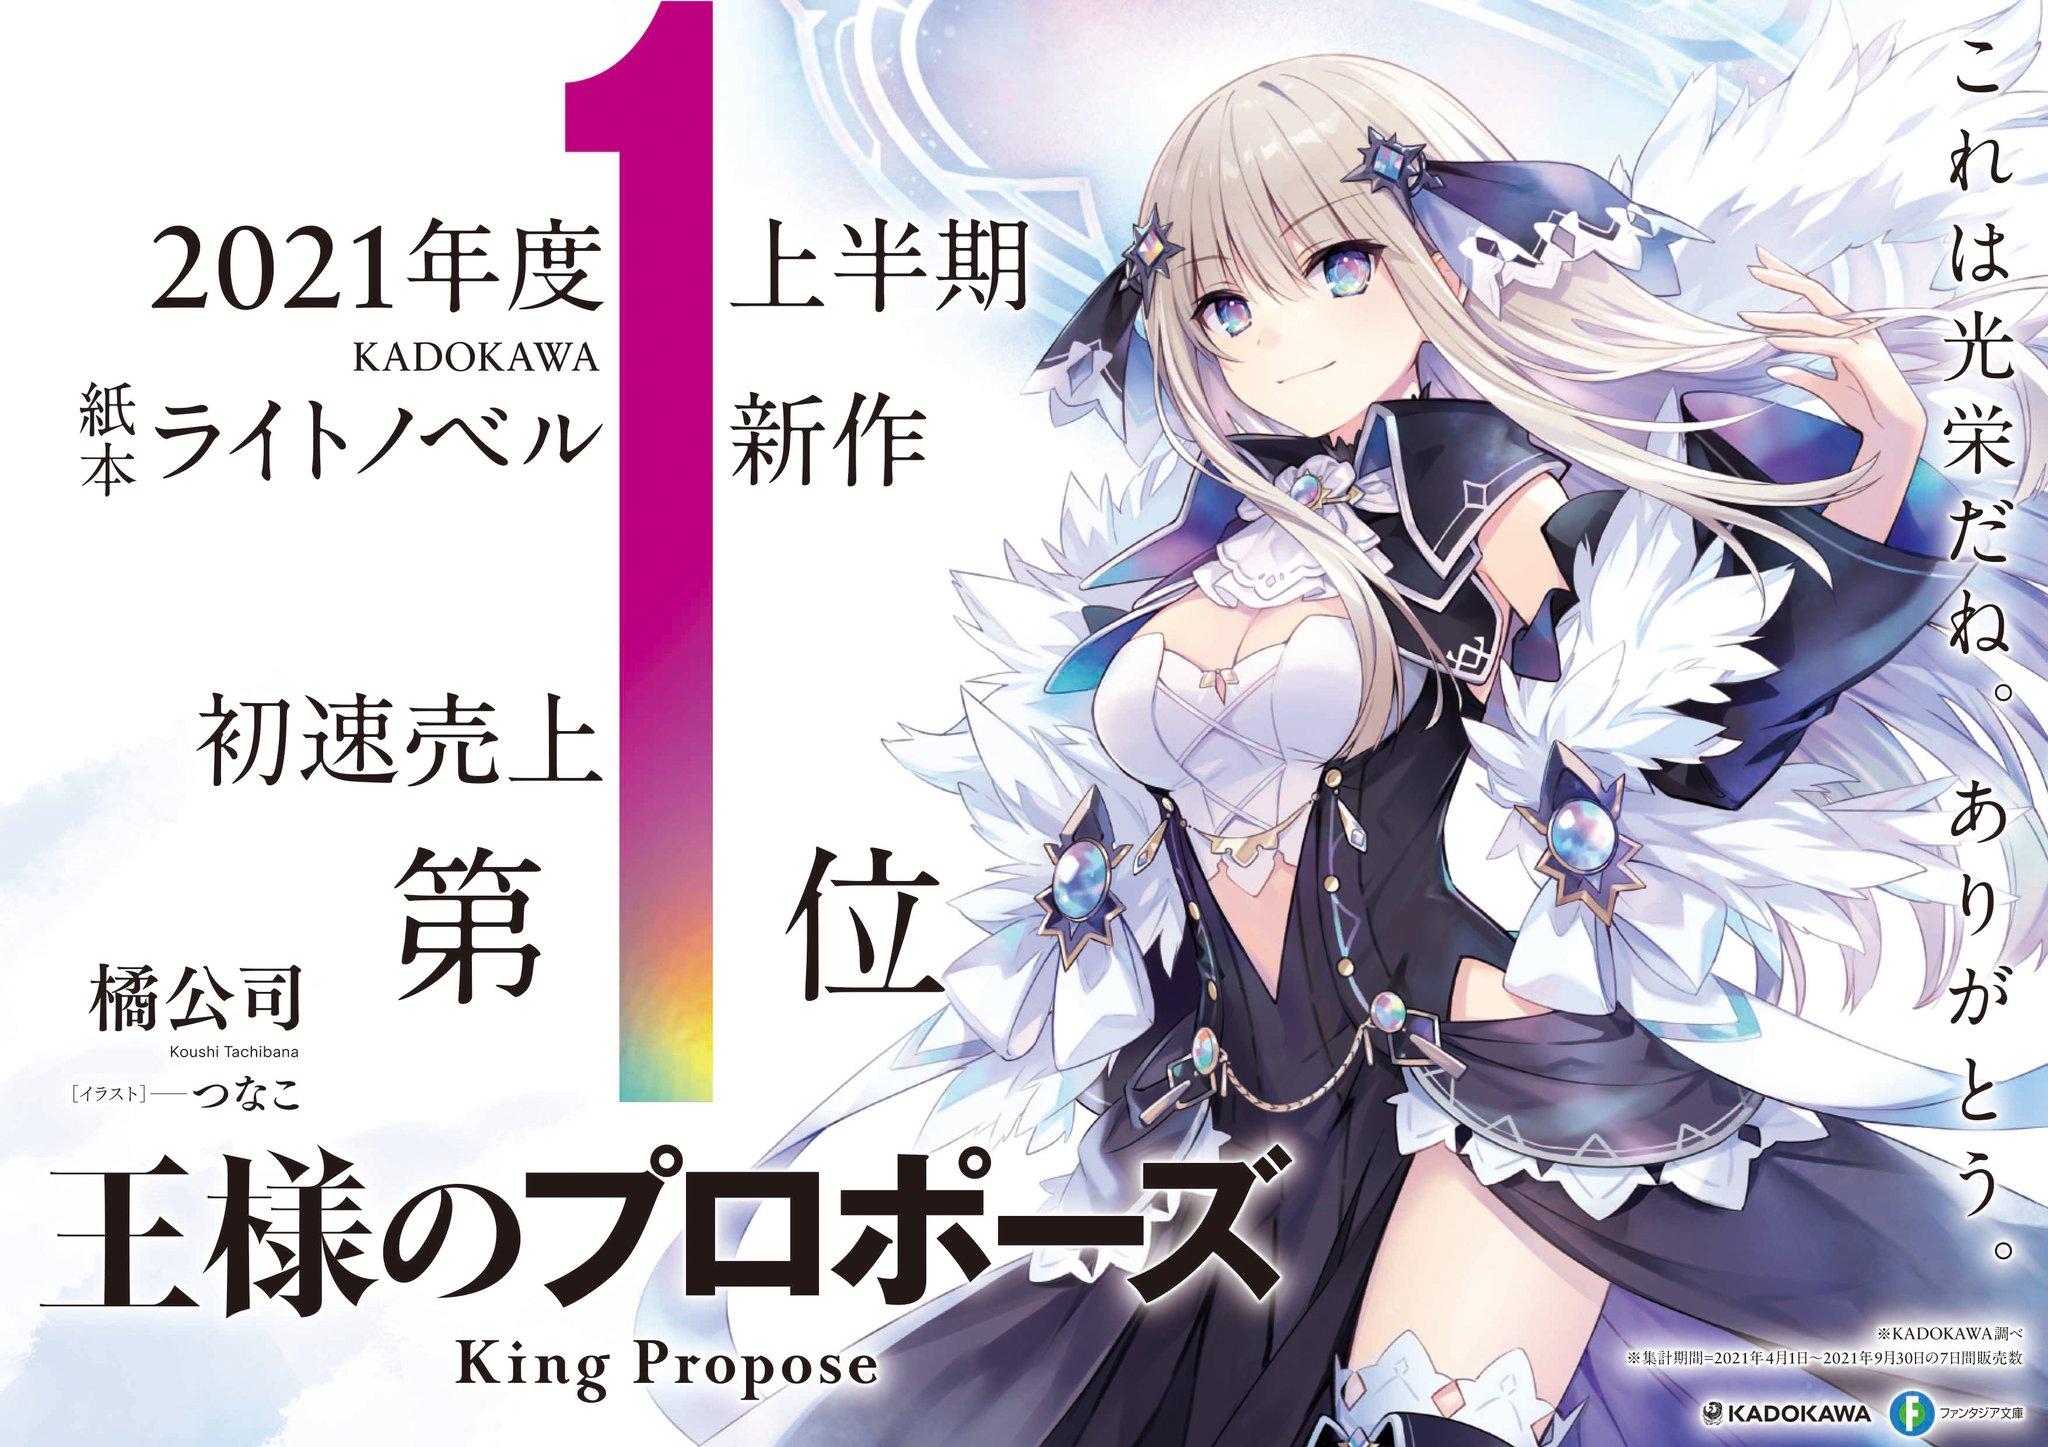 Ousama no Proposal: Gokusai no Majo fue la novela debut más vendida de Kadokawa